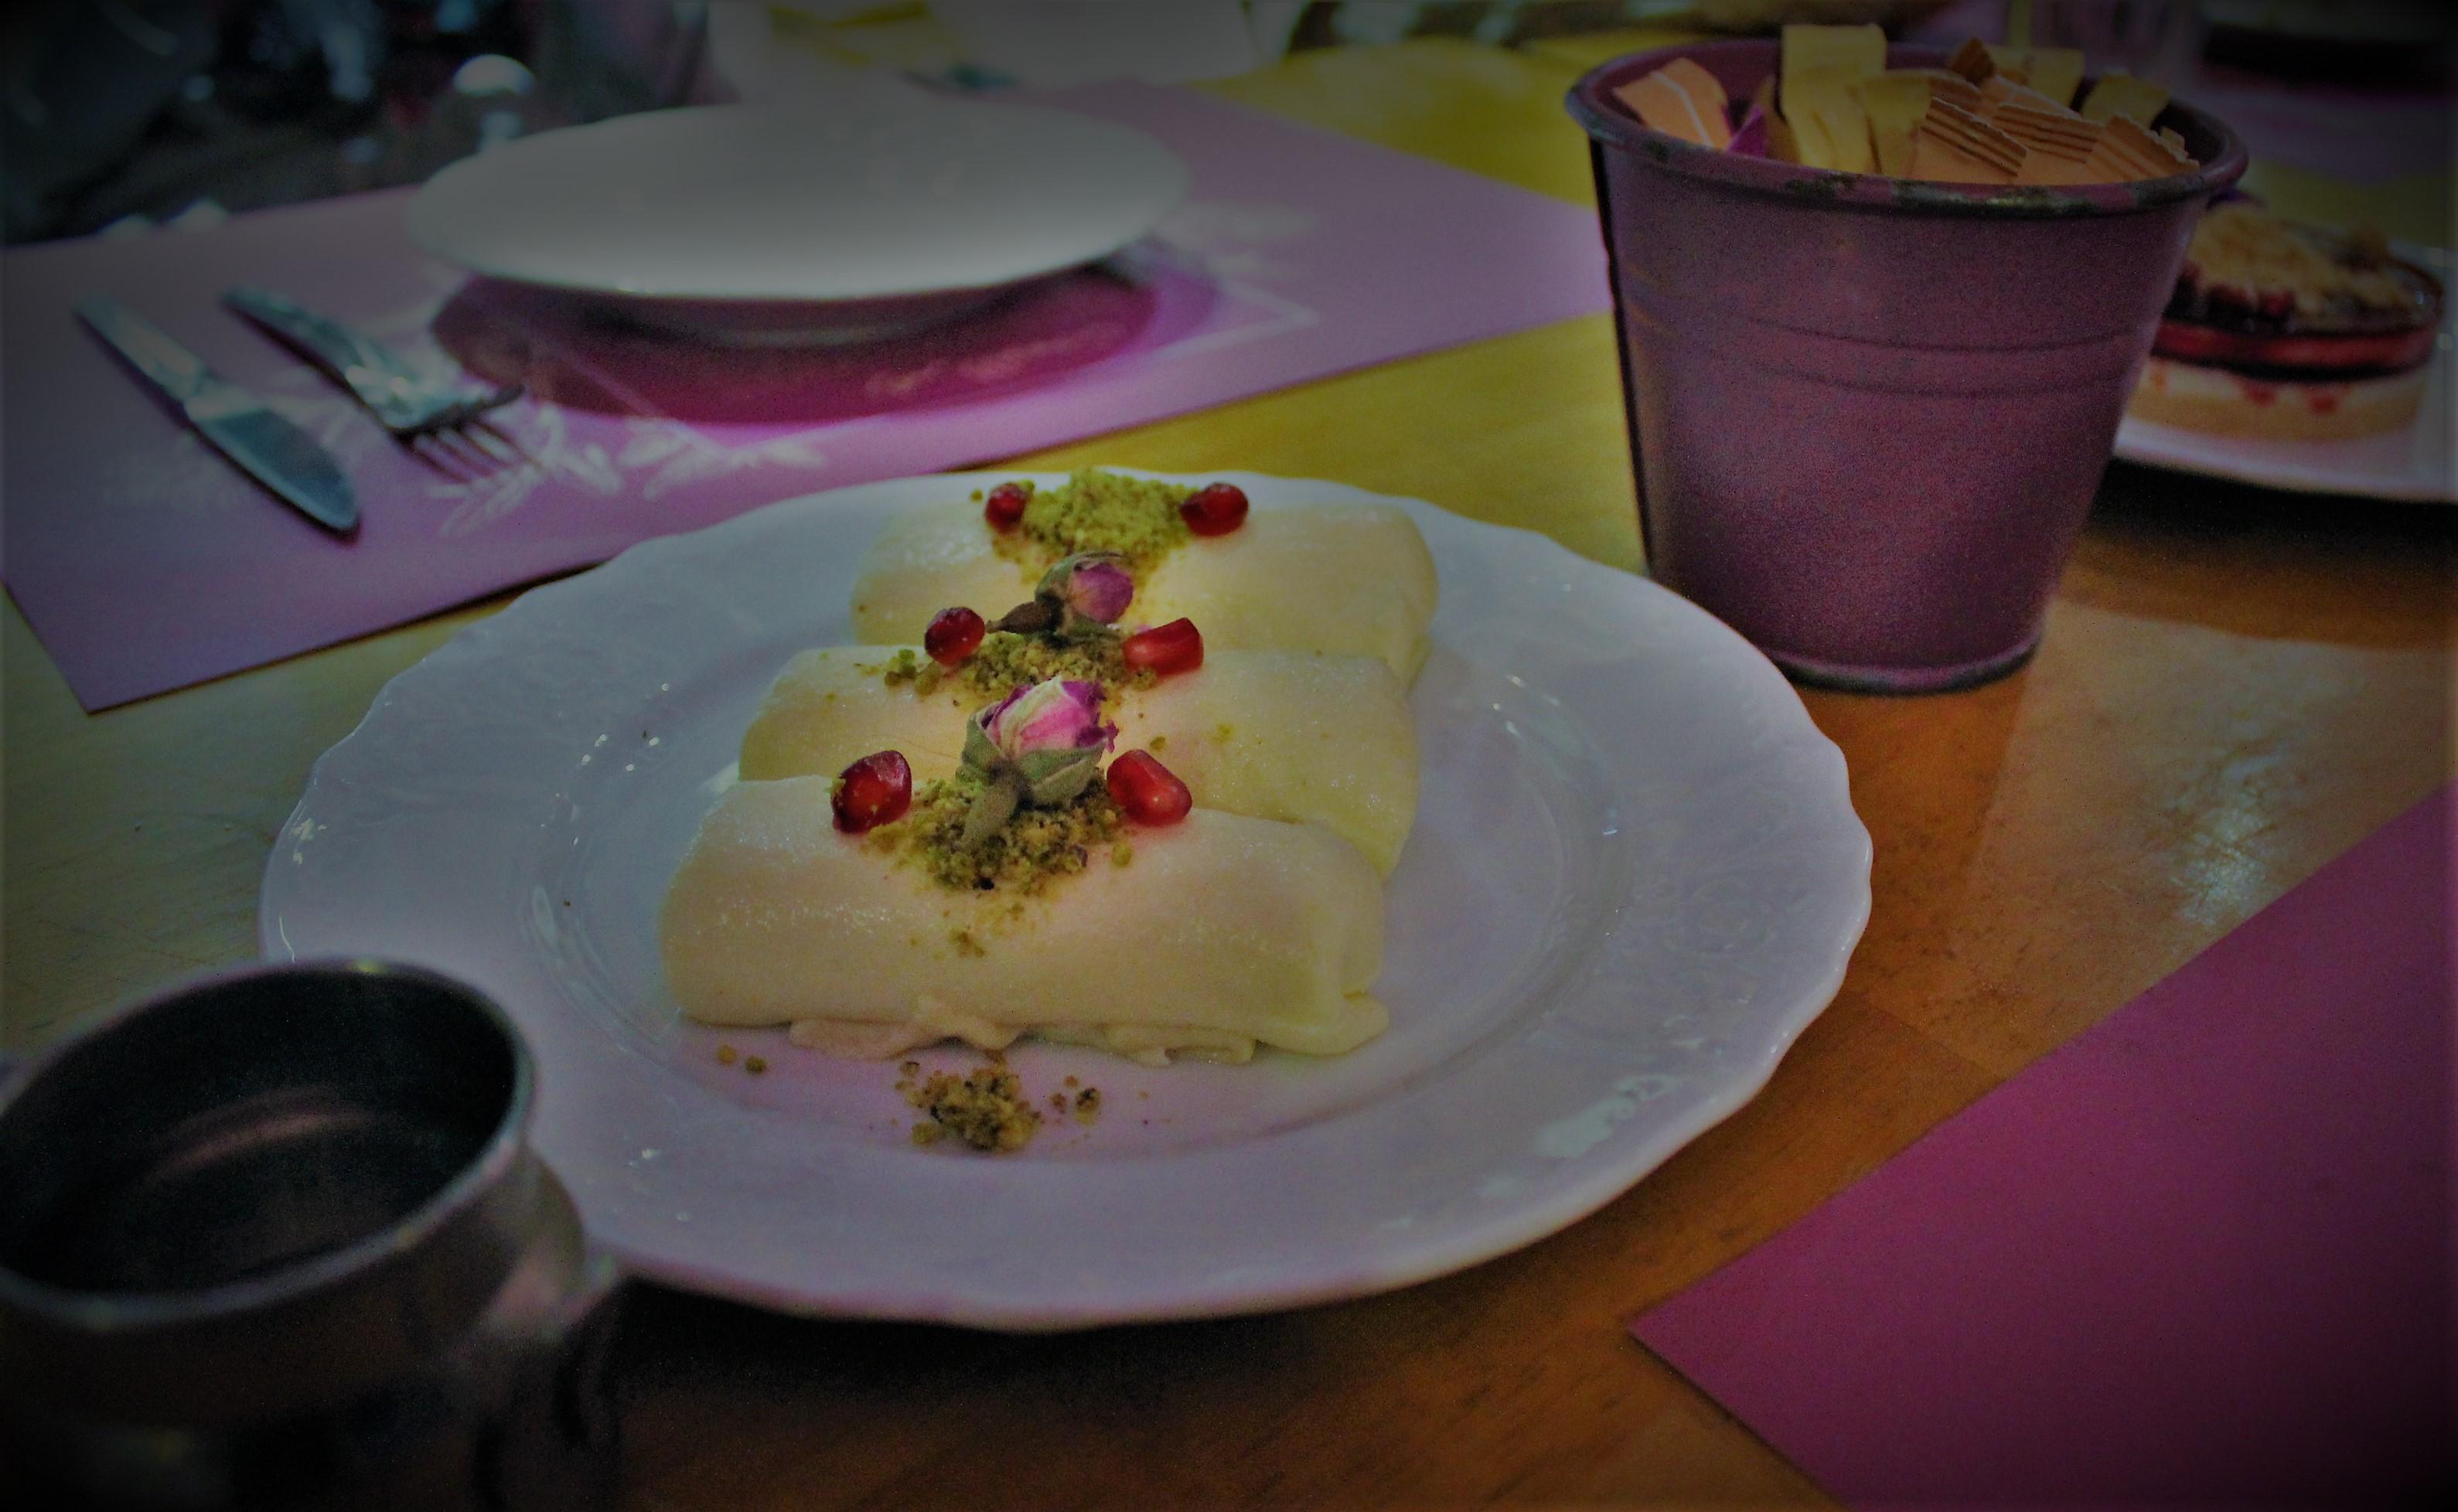 Halawat Al Jibn garnished with pistachio